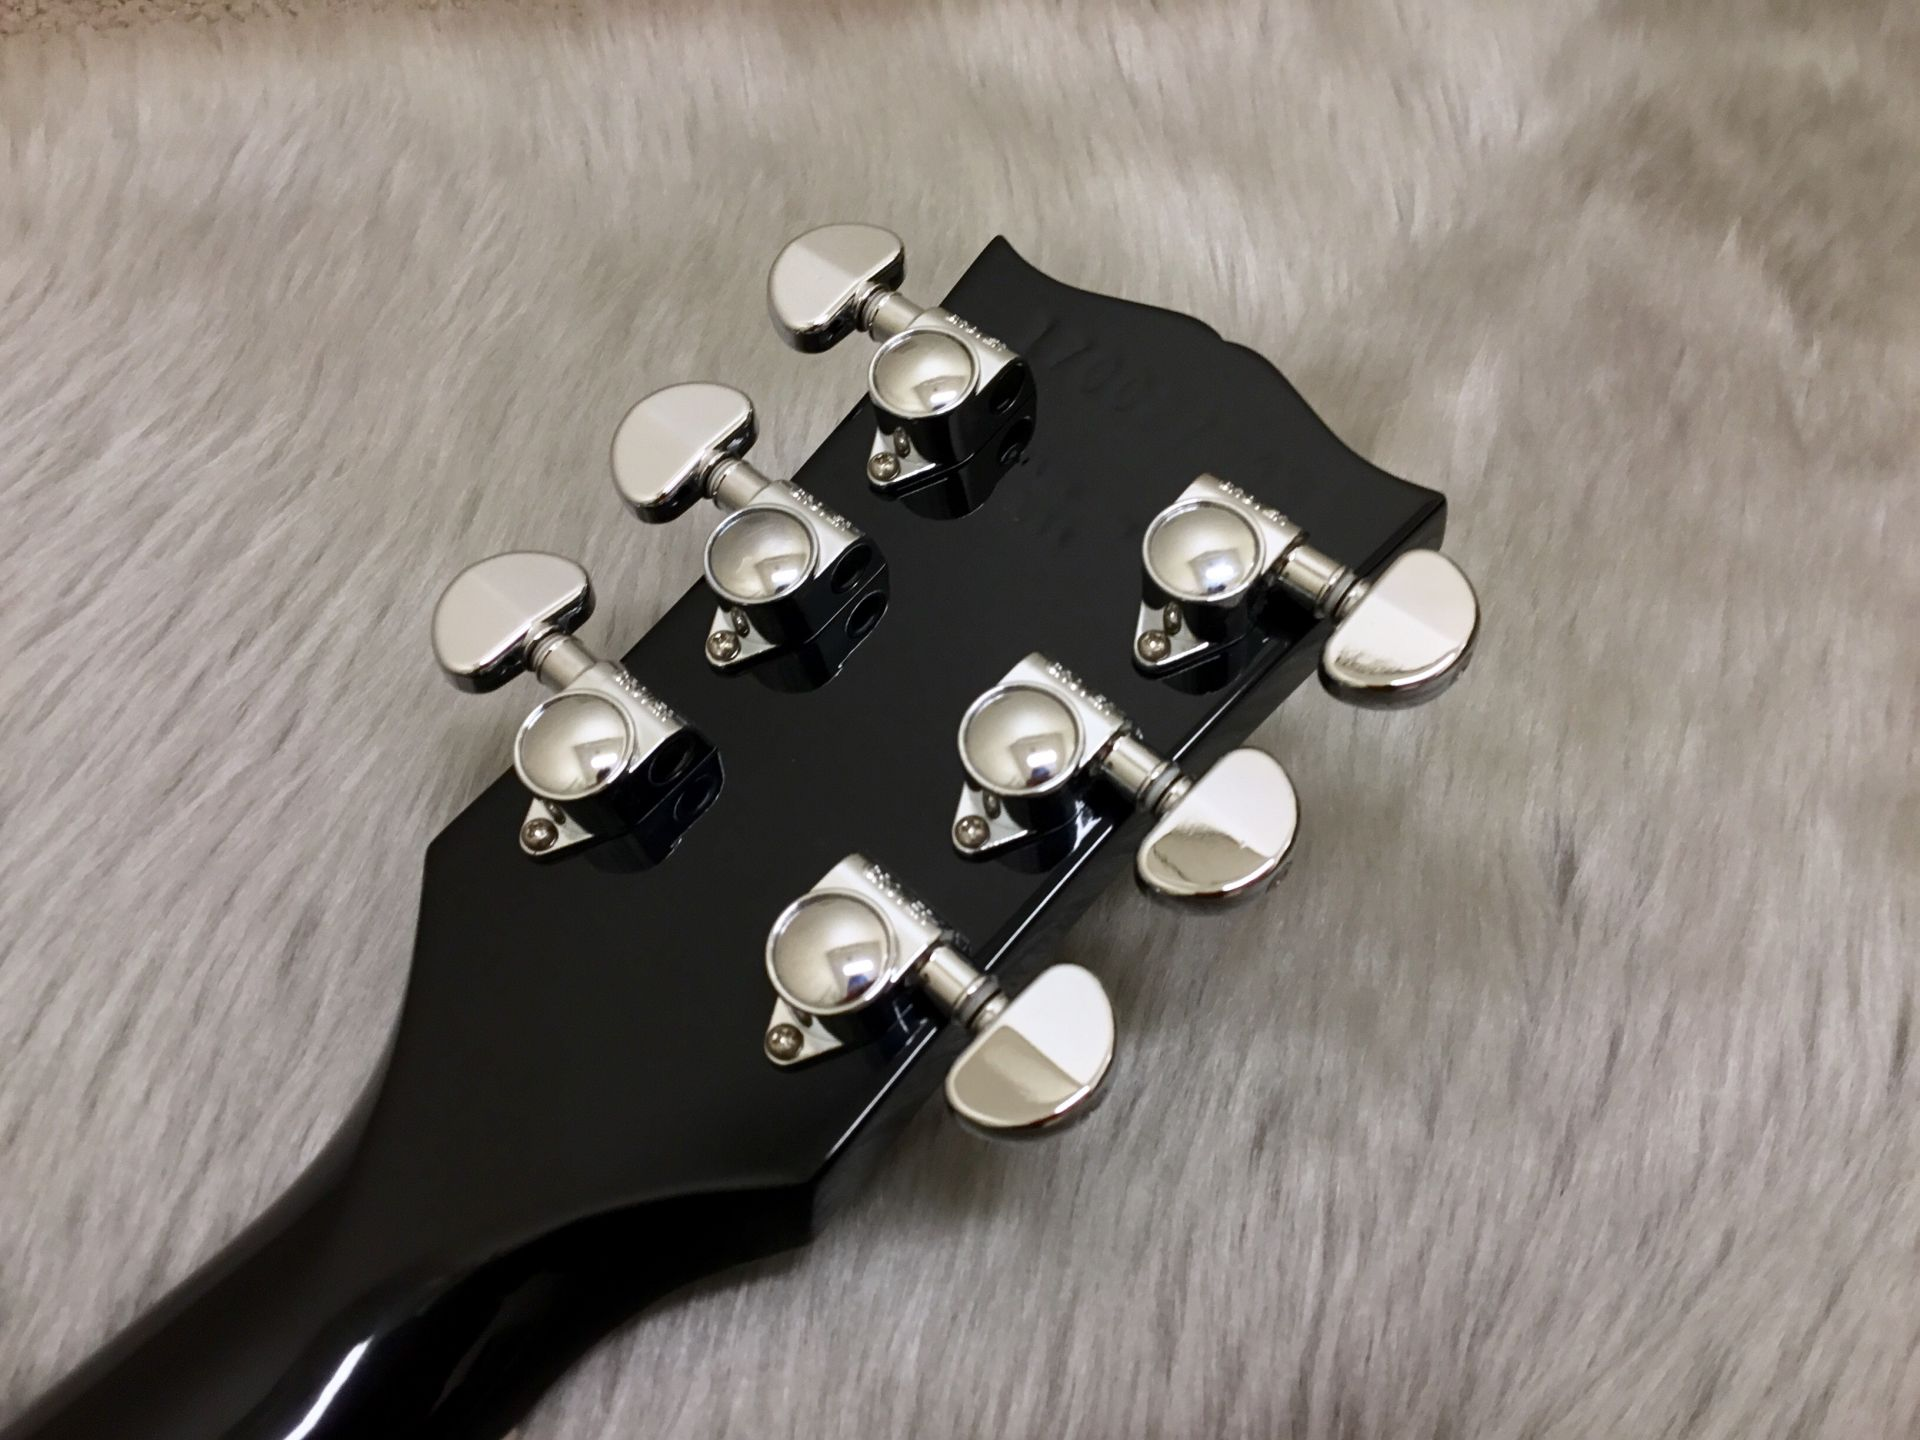 Gibson LesPaul Studio T 2017 Ebonyのヘッド裏-アップ画像